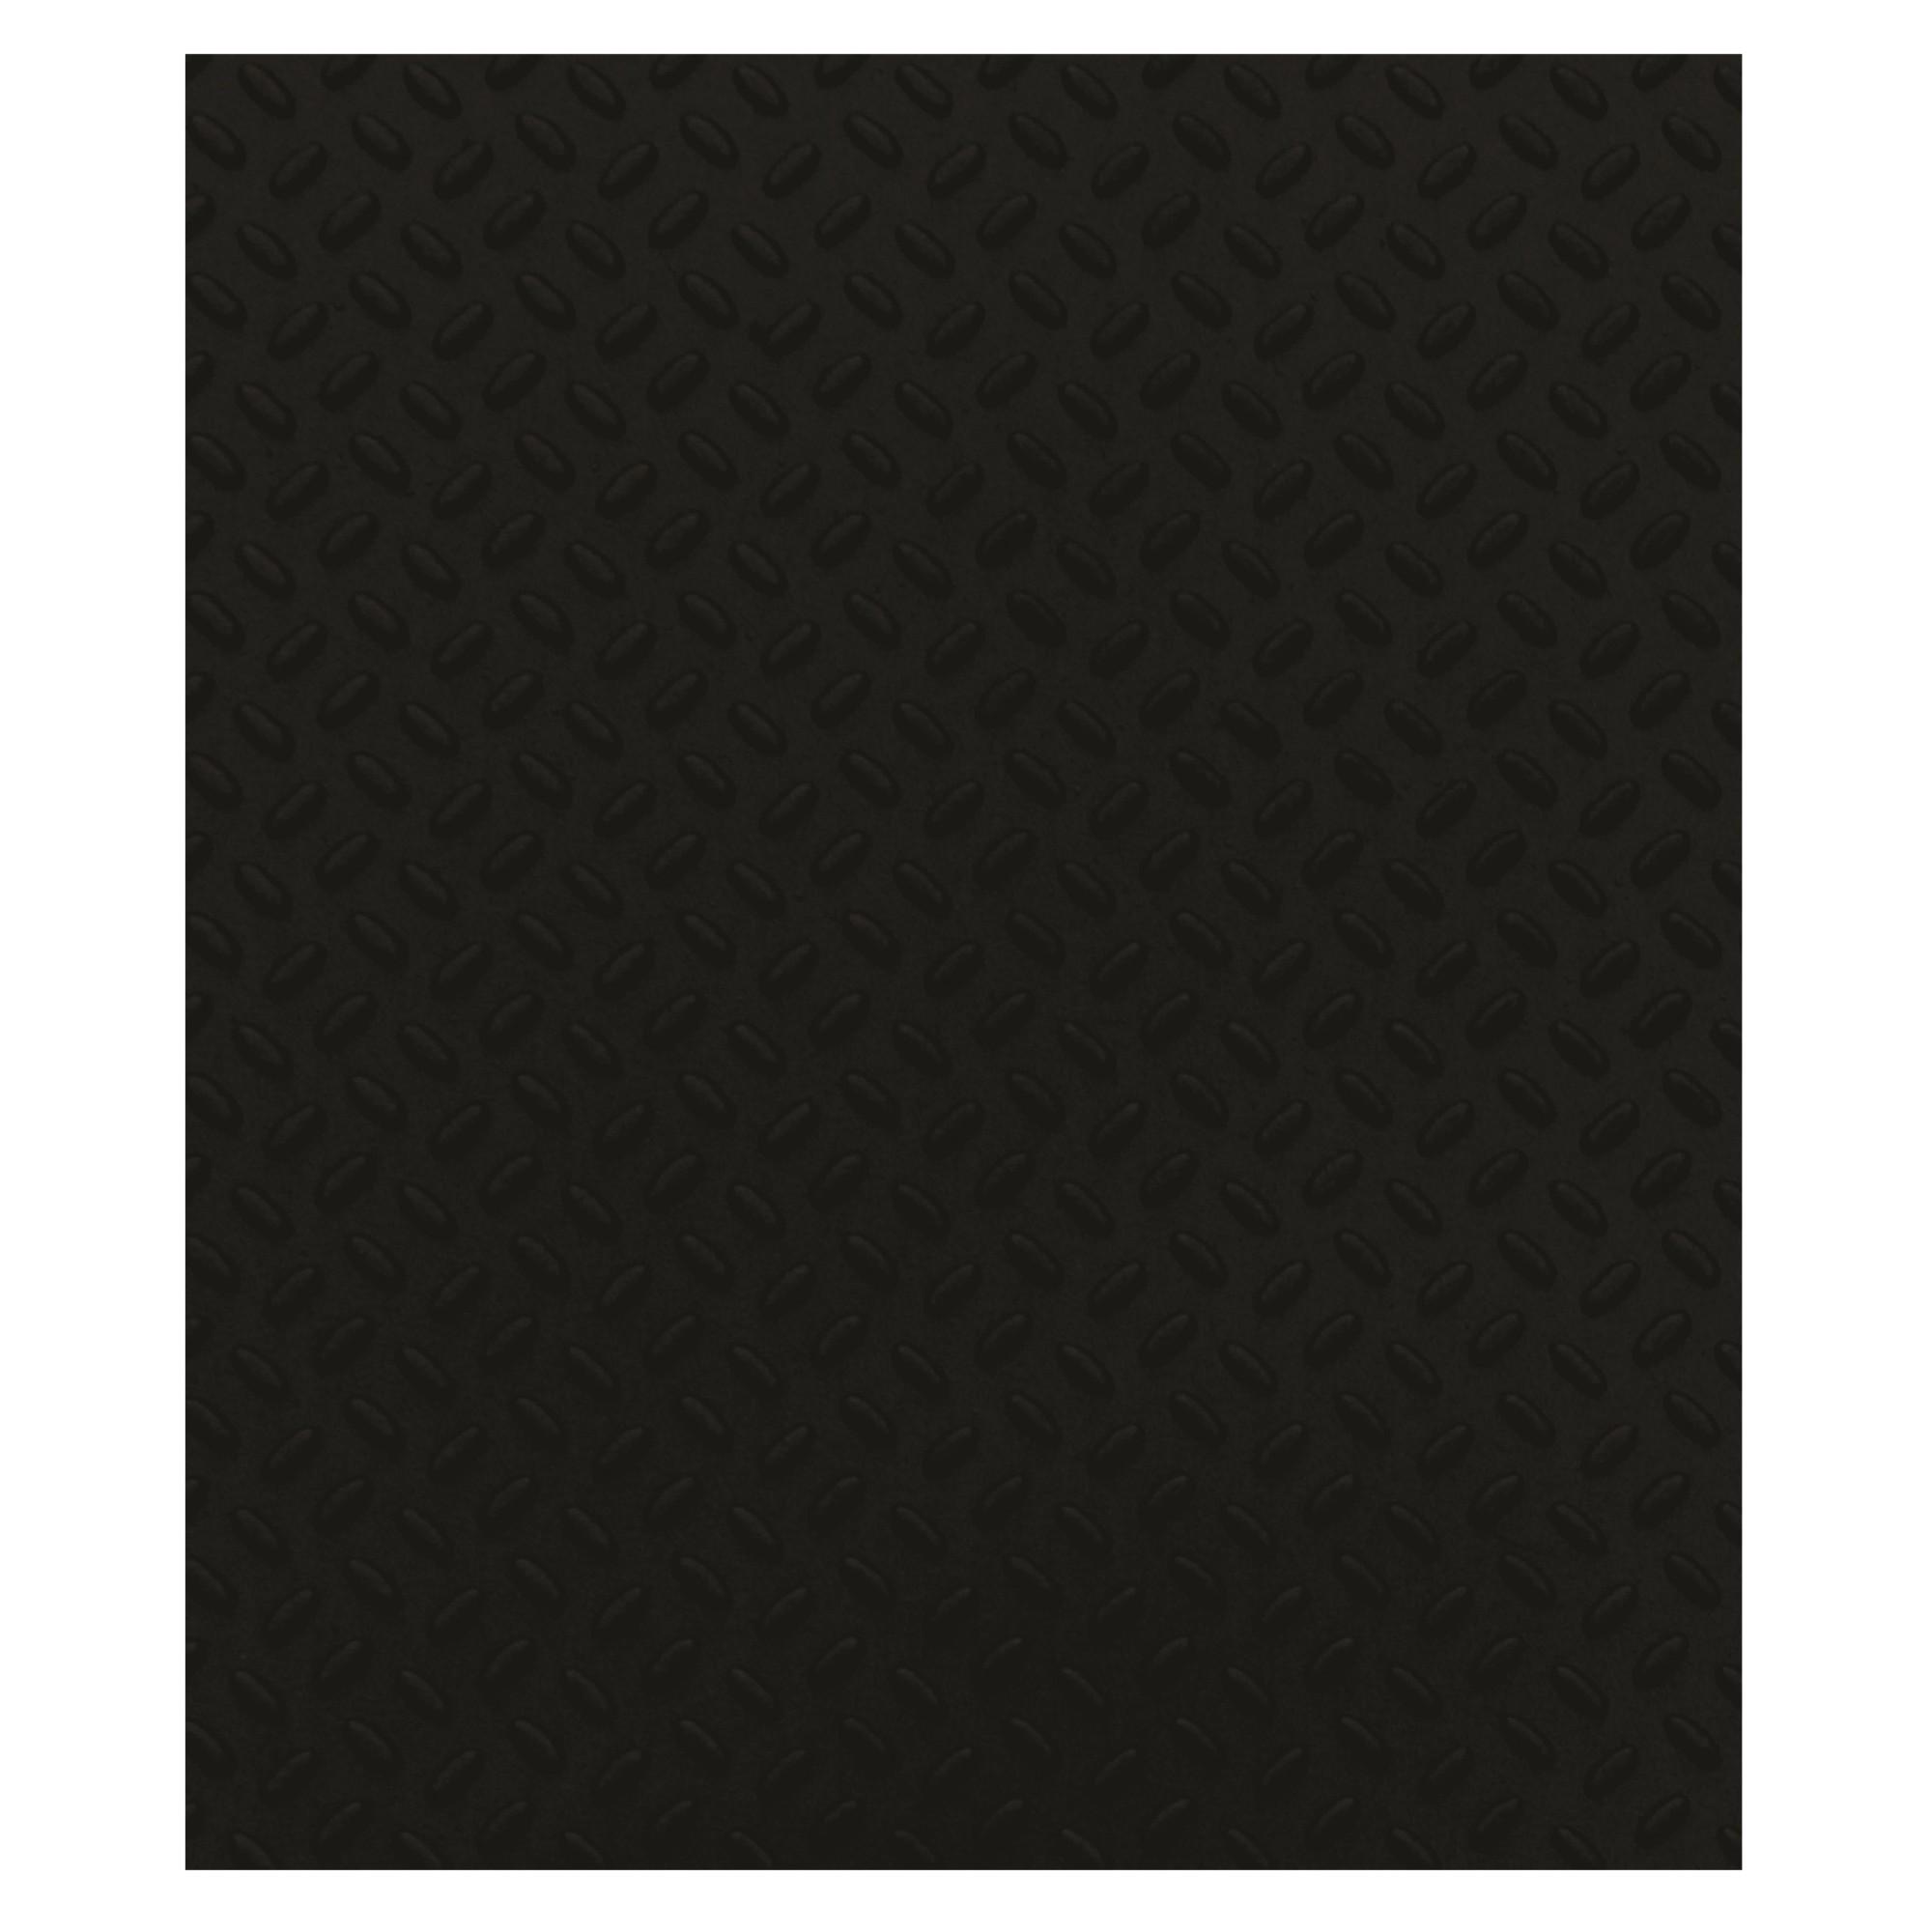 Pisos de PVC Grao de Arroz 130 m Preto - Kapazi